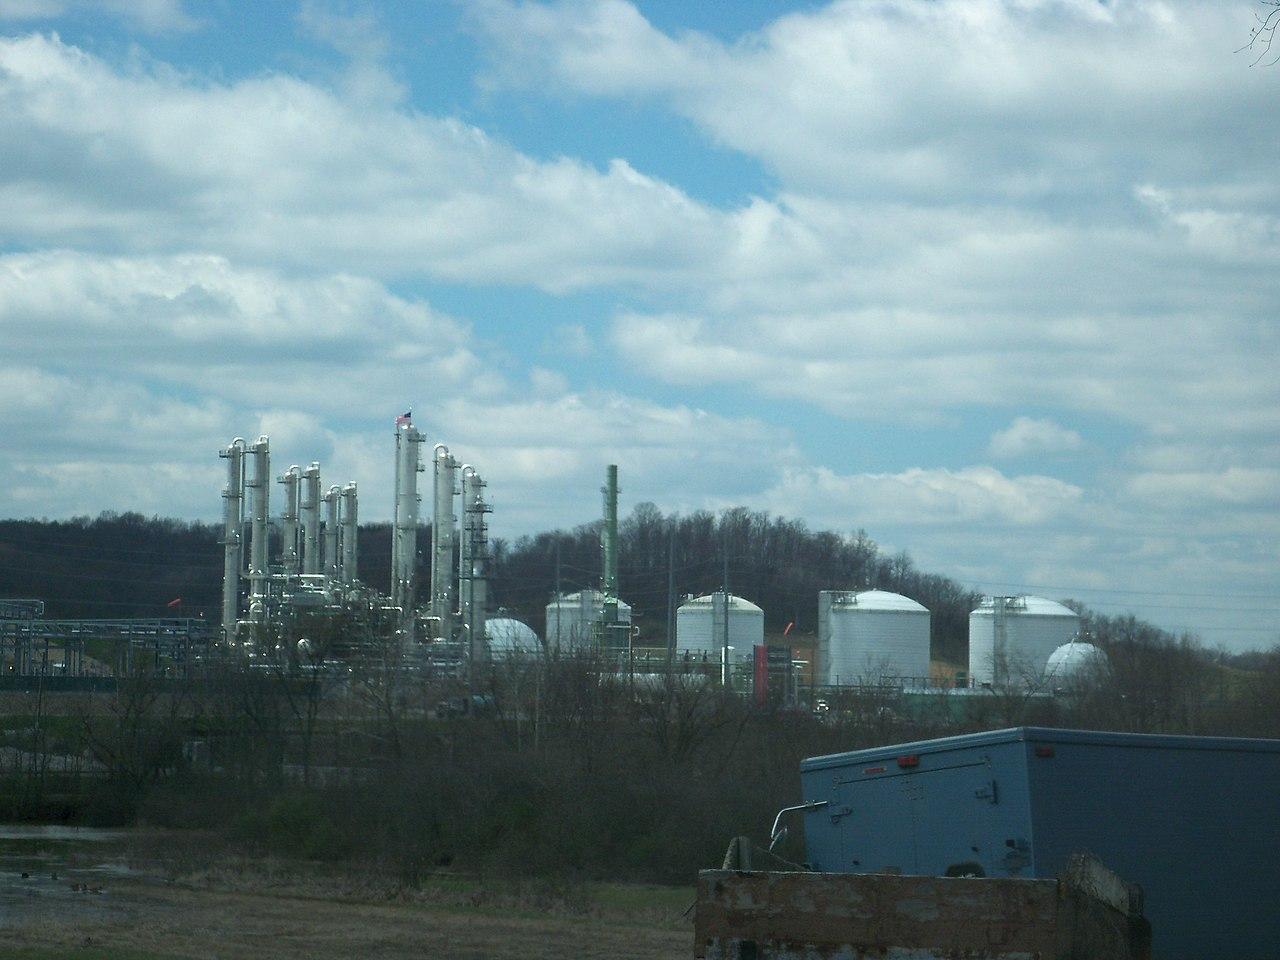 East Ohio Natural Gas Co